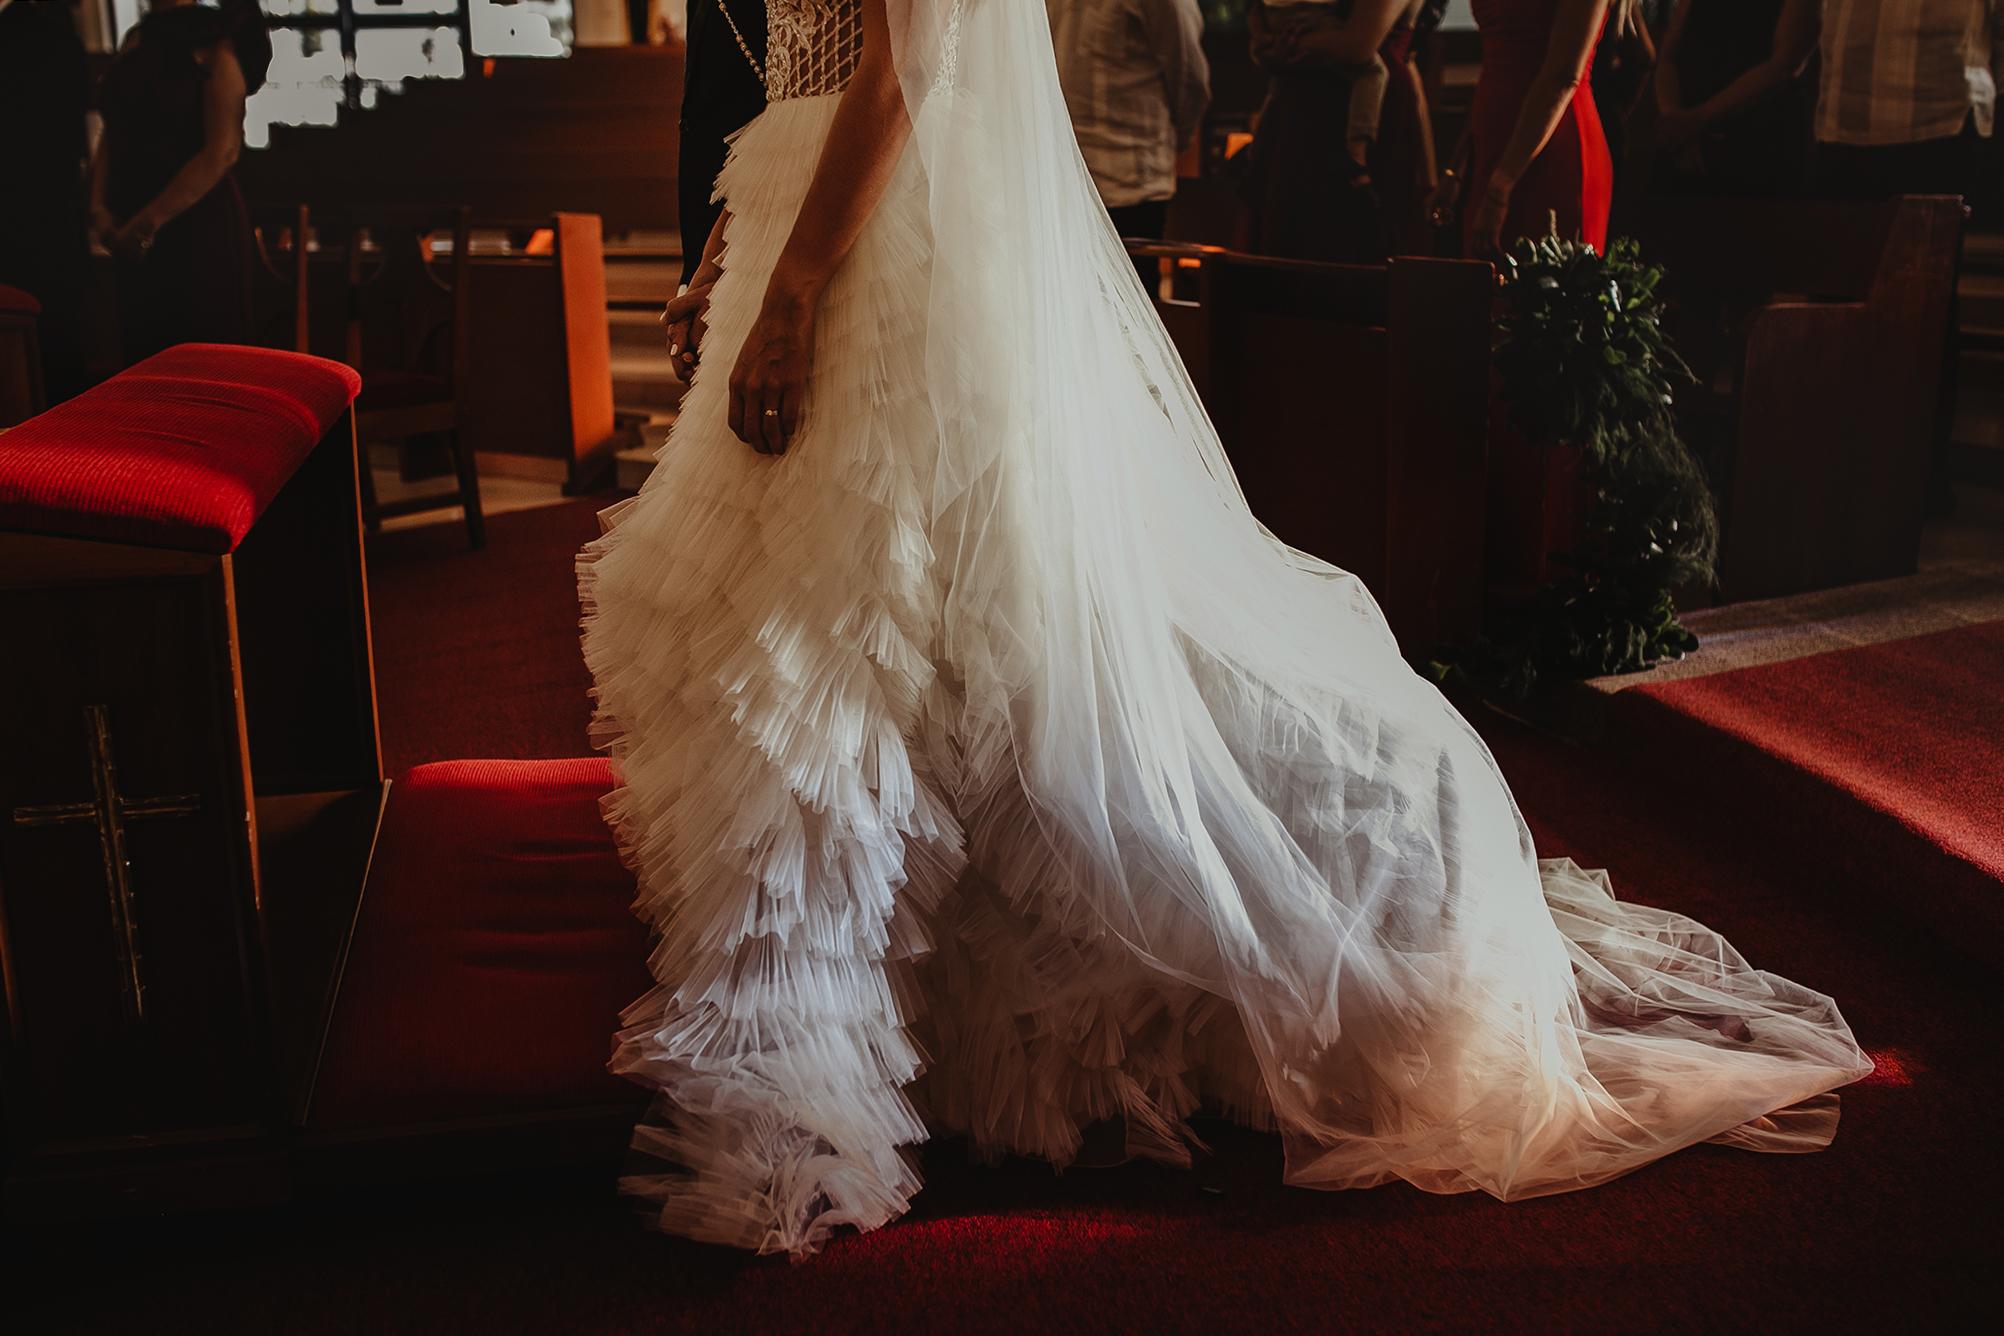 0718R&F__WeddingDestination_Weddingmerida_BodaMexico_FotografoDeBodas_FabrizioSimoneenFotografo.jpg